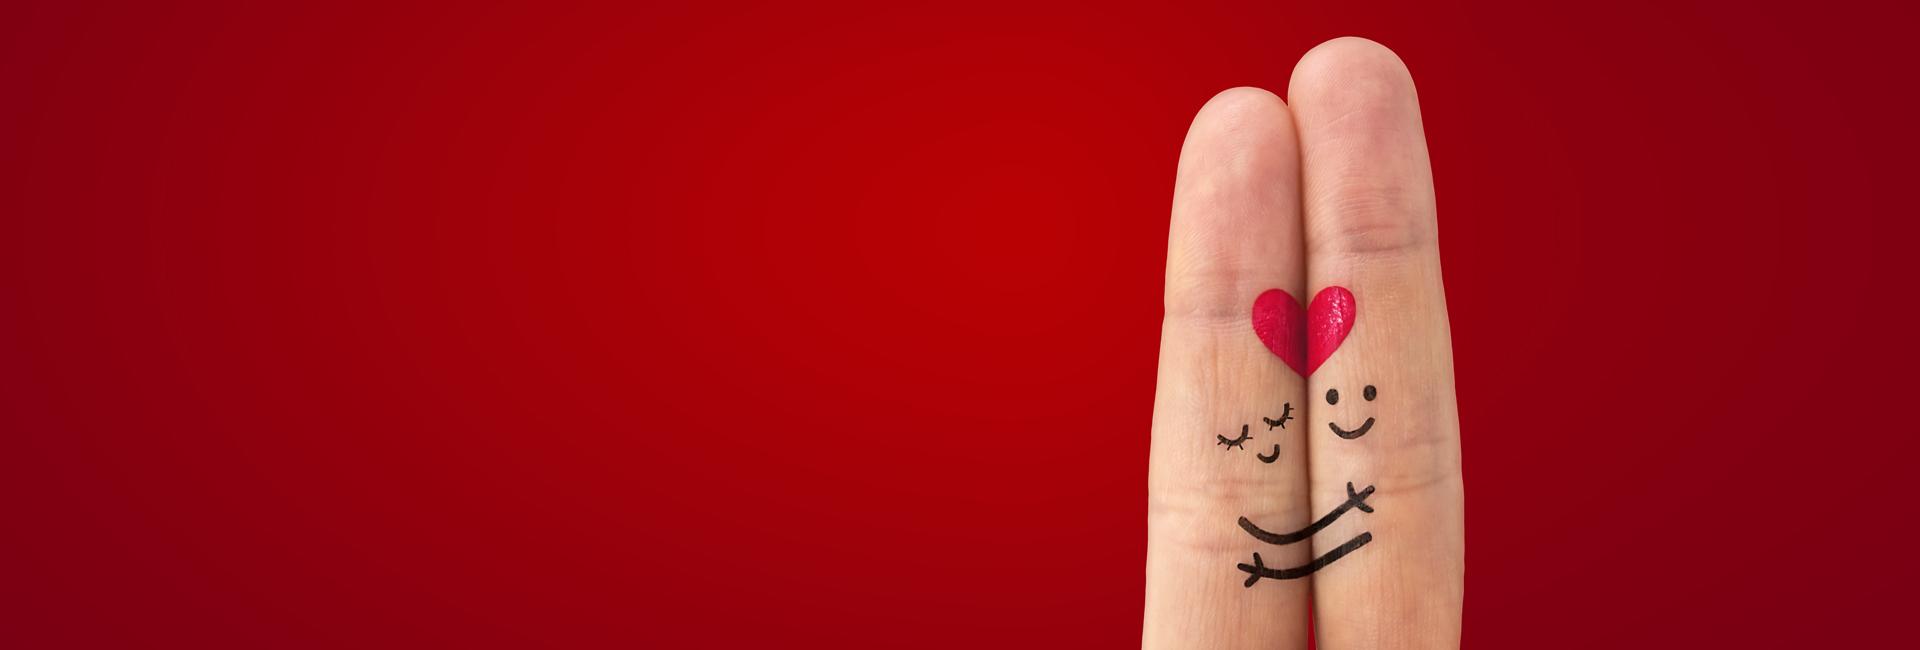 Valentine's Day – Cute celebration or marketing mechanism?